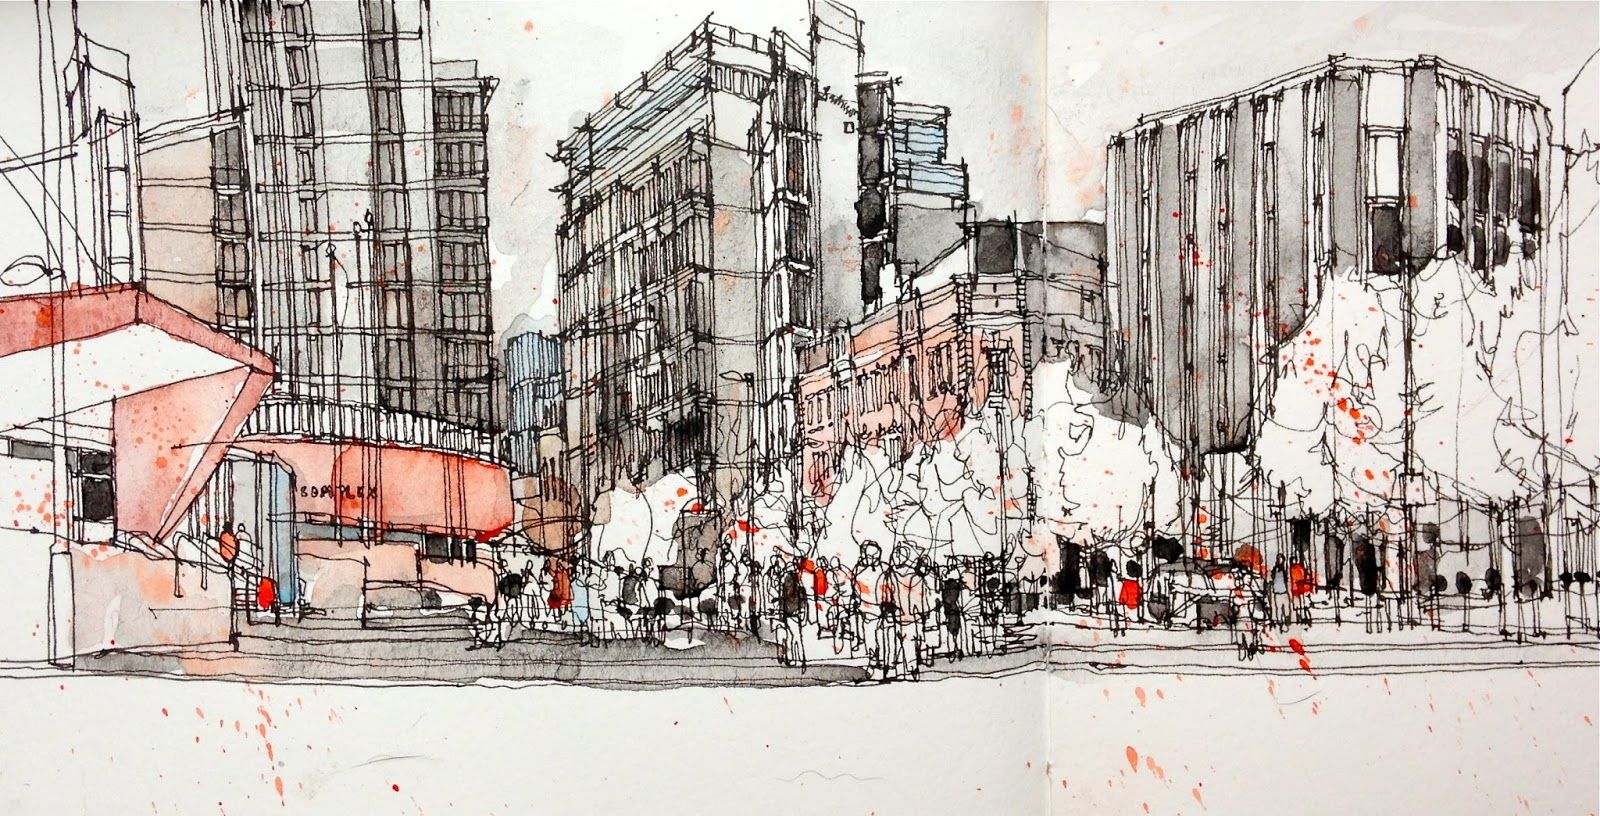 4th International Urban Sketching Symposium Recent Sketches Channeling Bcn Urban Sketching Architecture Sketch Urban Sketchers